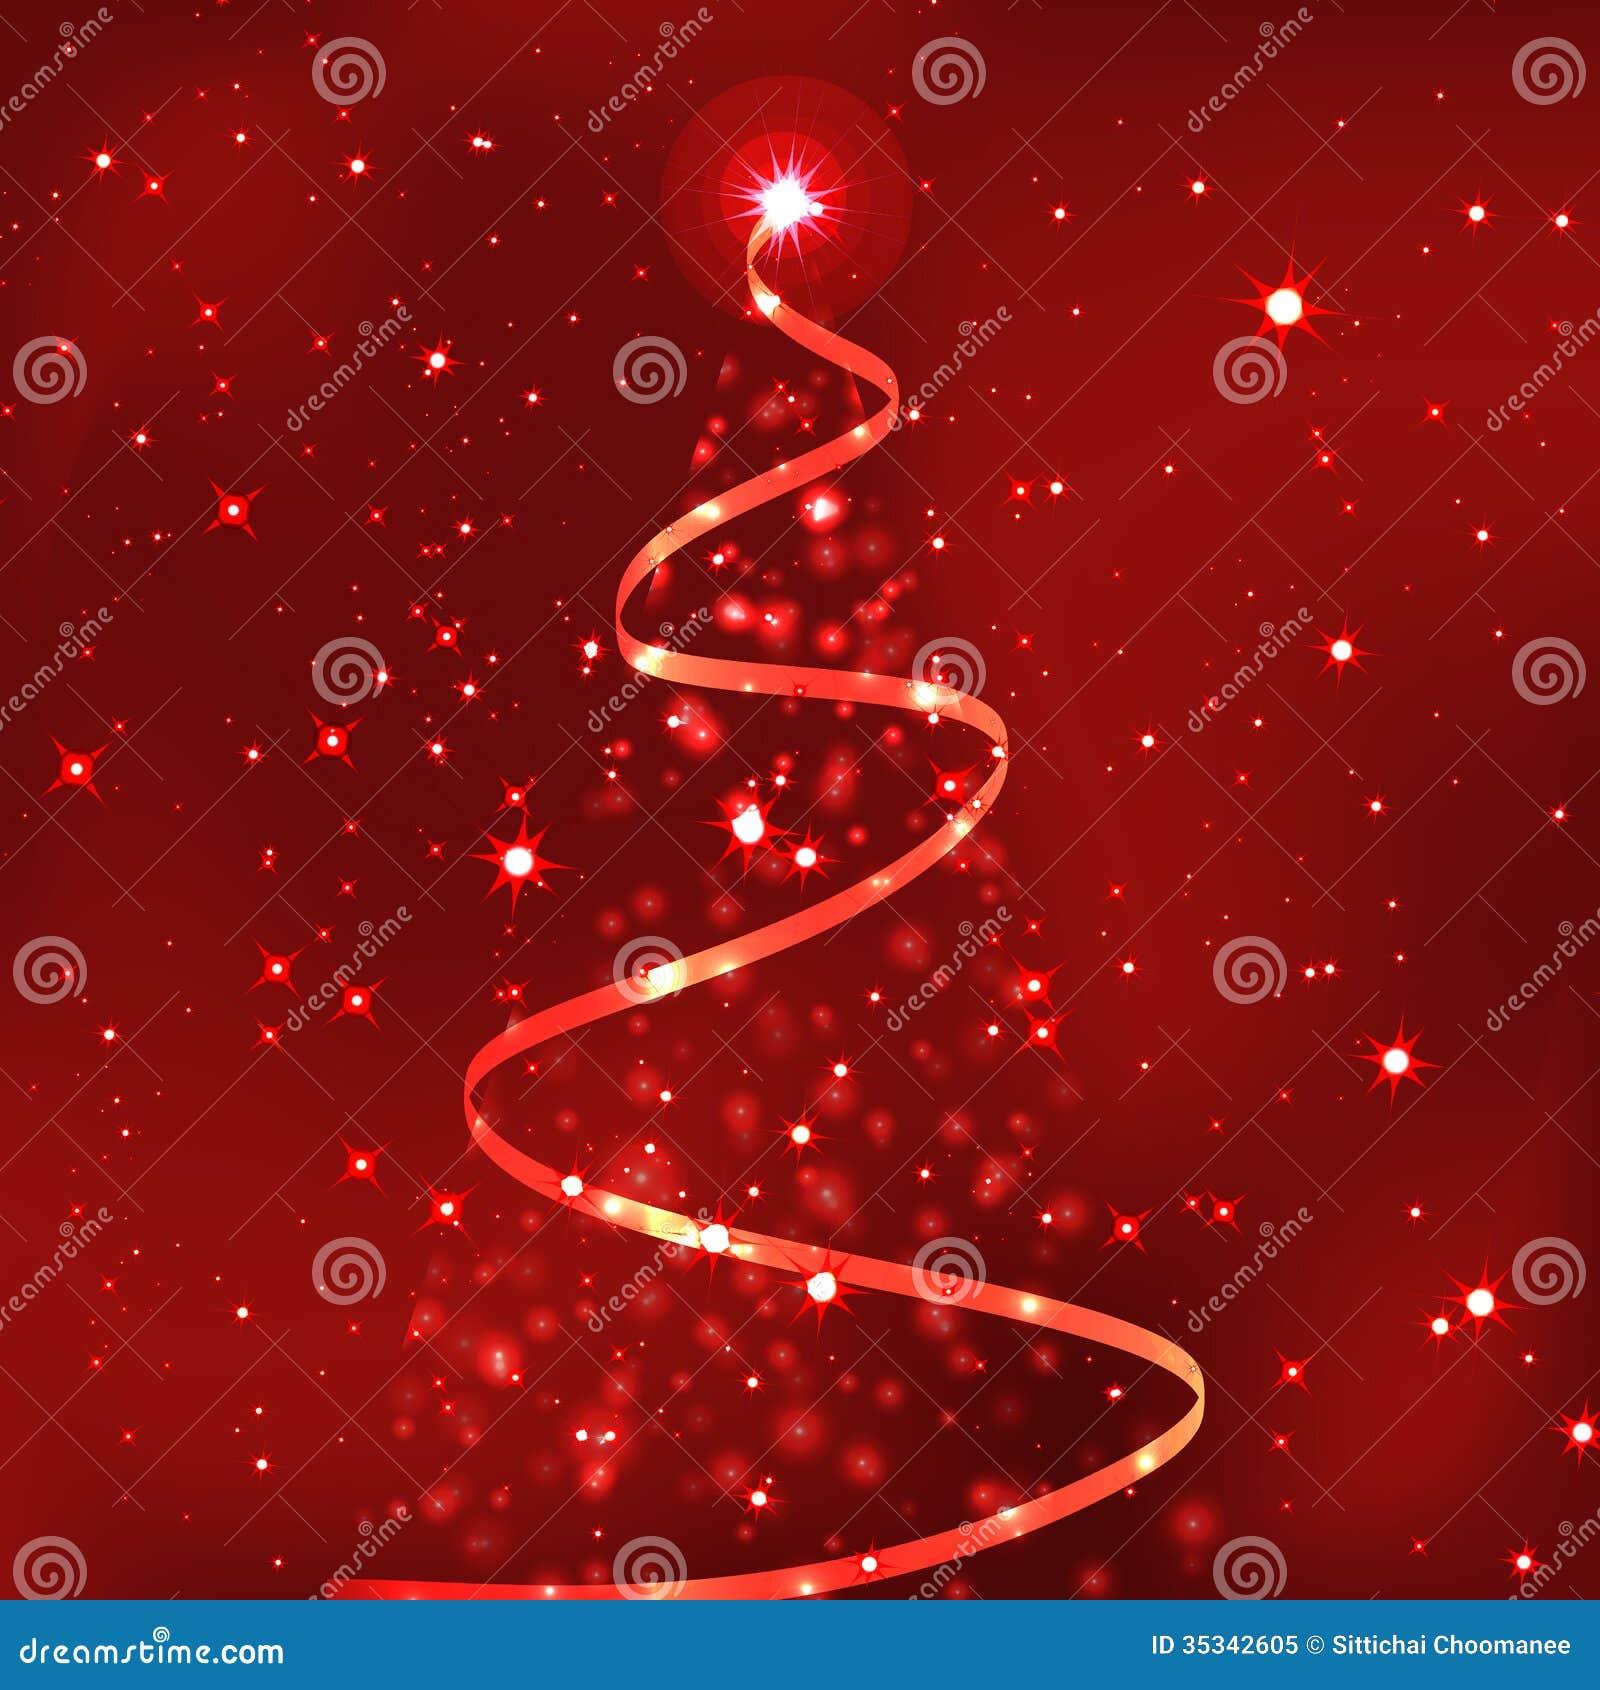 Beautiful Christmas Trees: Most Beautiful Christmas Trees Stock Vector